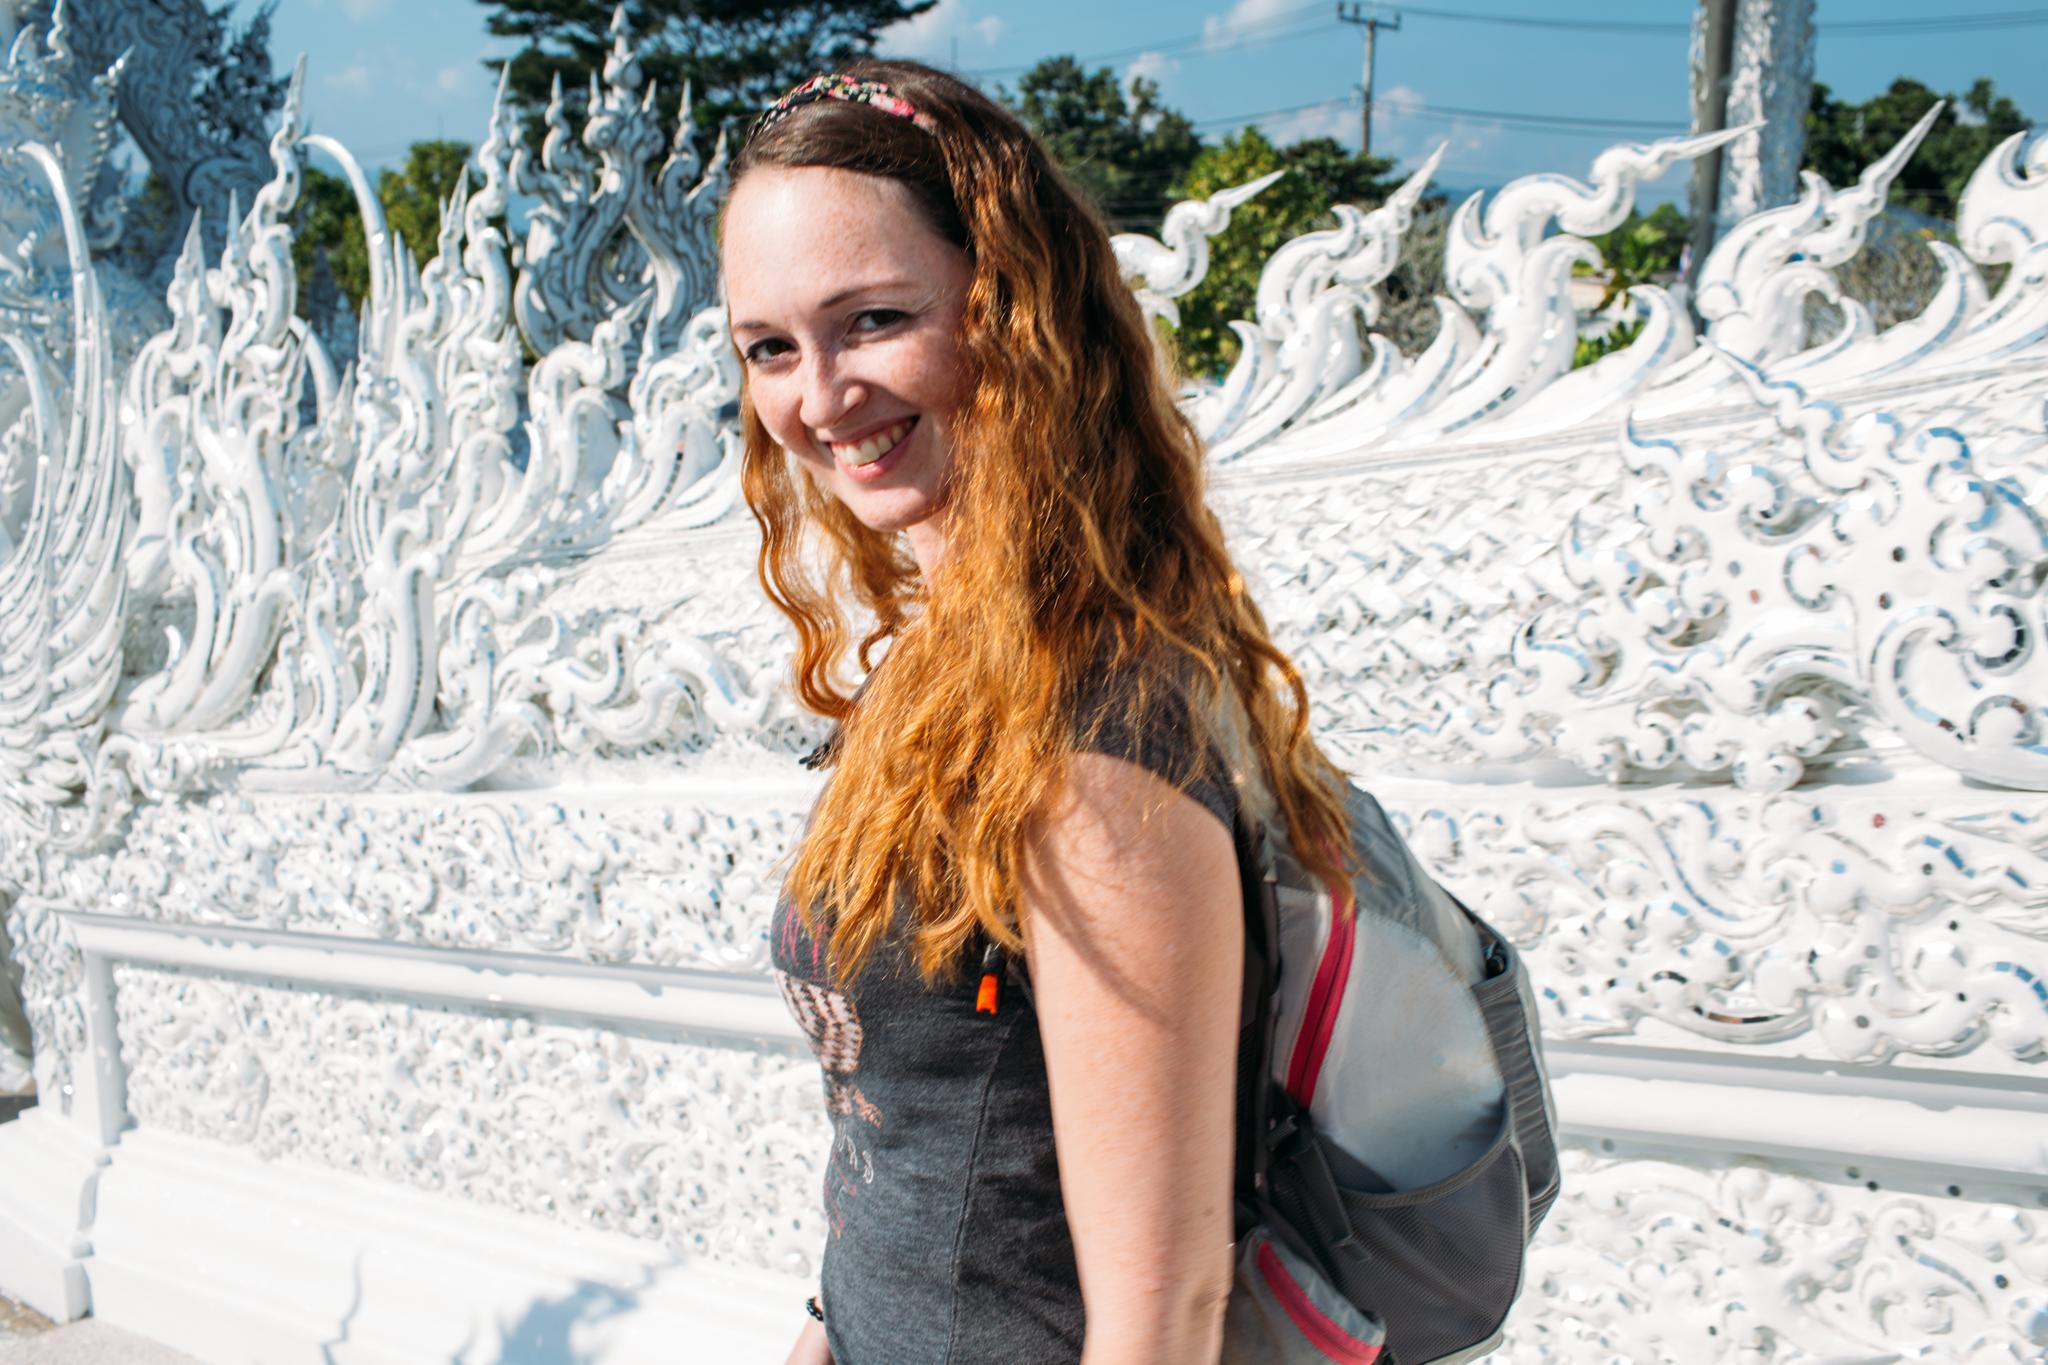 templo branco eduardo e monica